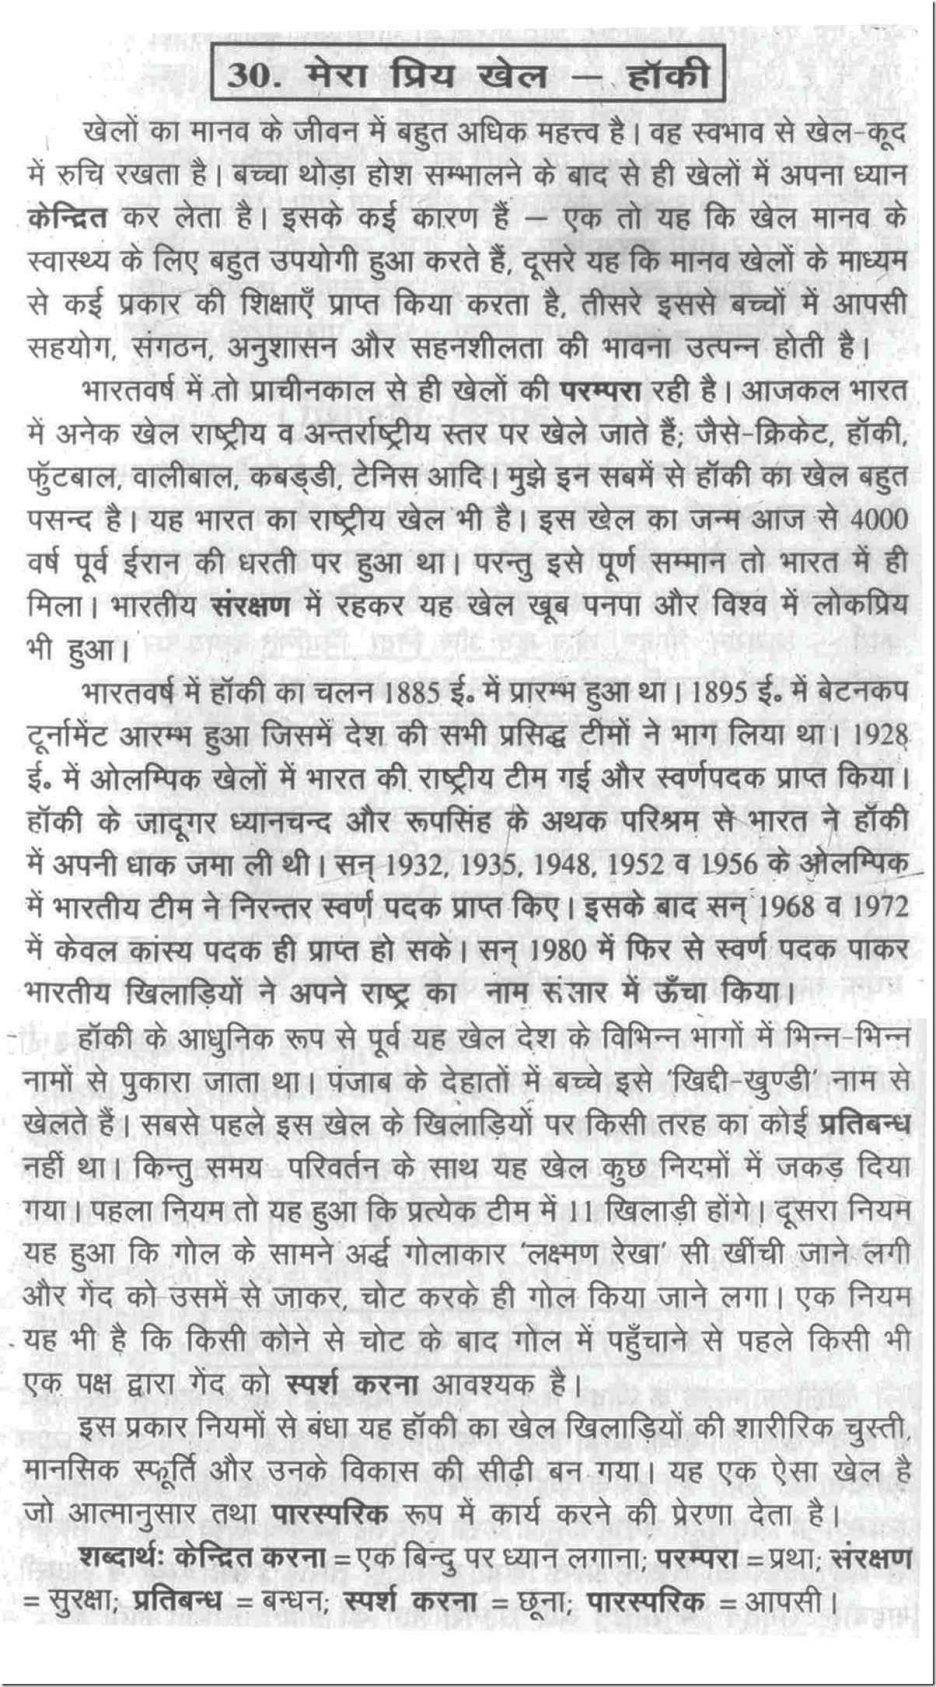 007 Favorite Sport Essay Thumb My In Hindi Basketball Football Cricket Badminton On About Skiing Soccer Sample Swimming For Kids Free Ielts 936x1687 Imposing Sportsman Virat Kohli Volleyball Full